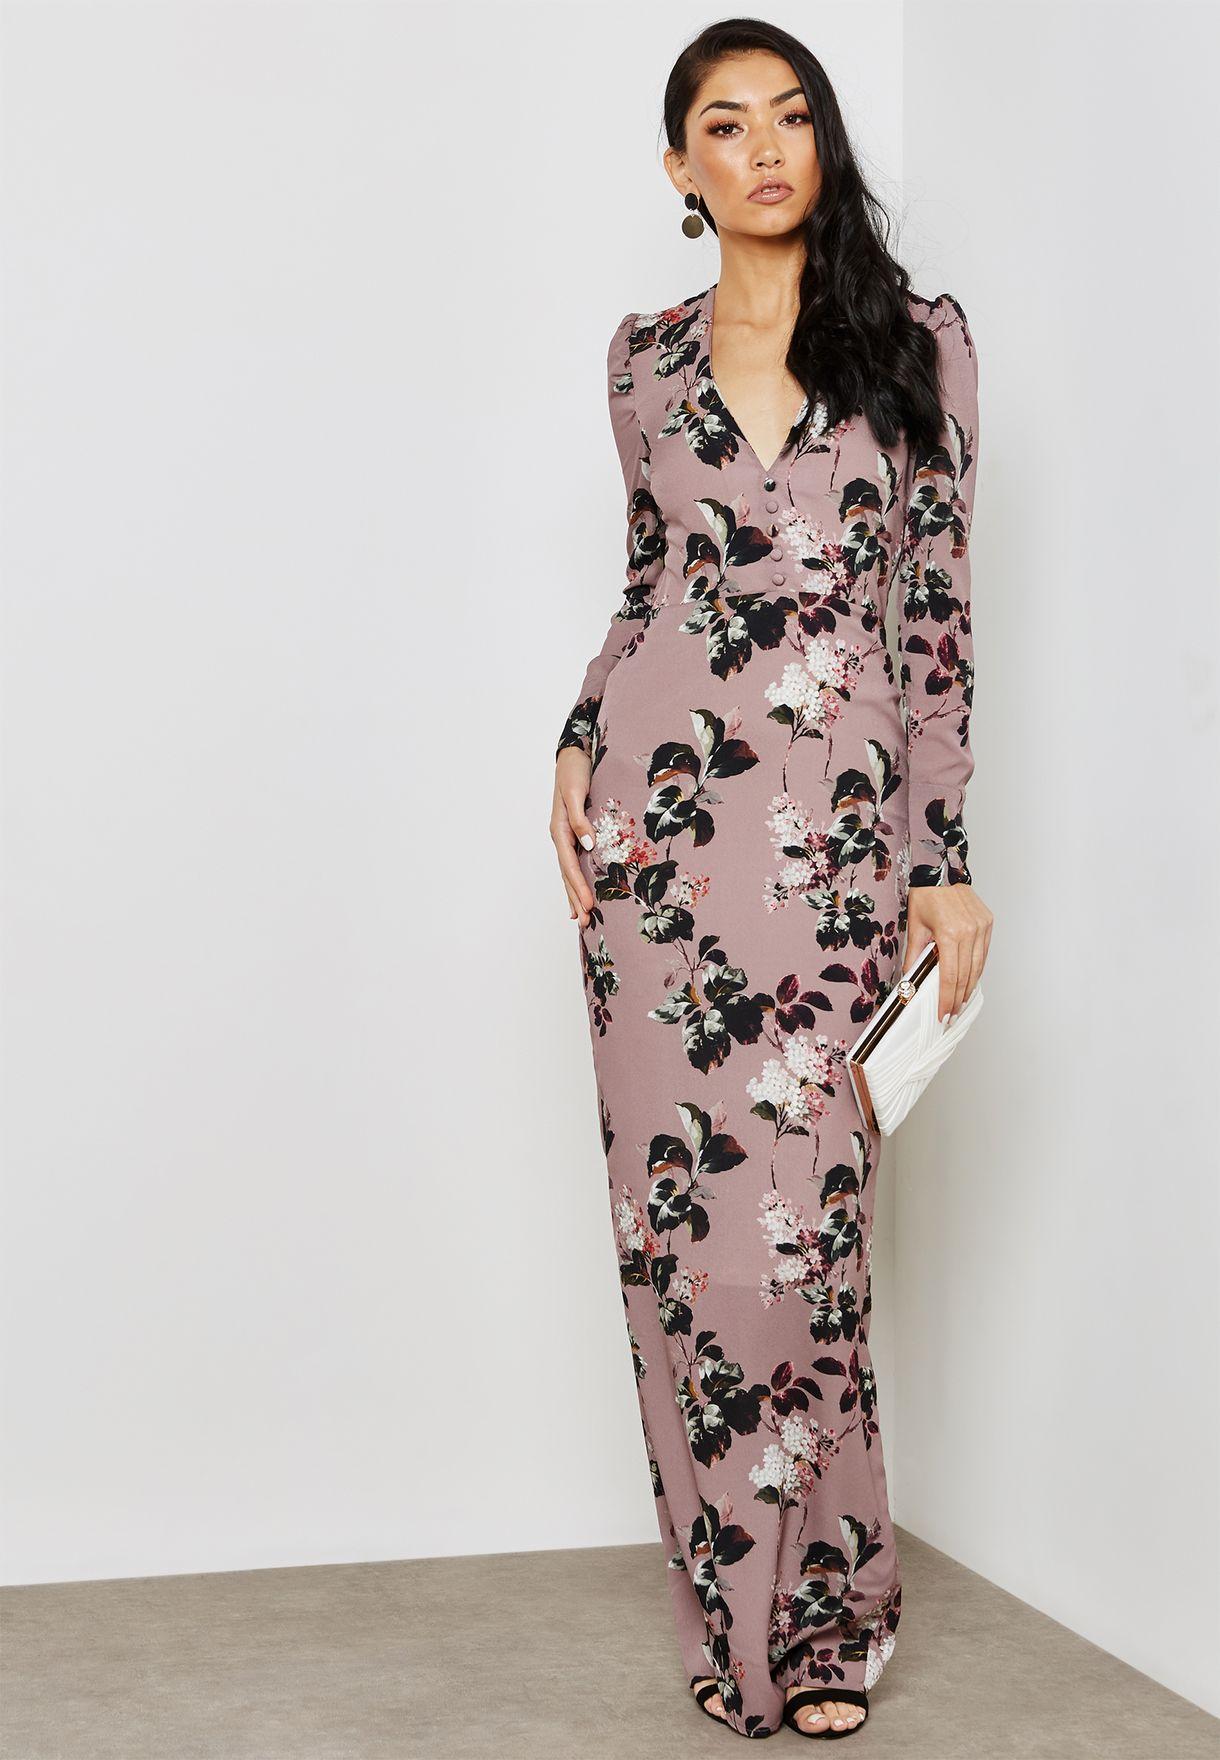 6e6e4a00c779 Shop Hope and Ivy prints Long Sleeve Plunge Floral Print Maxi Dress ...